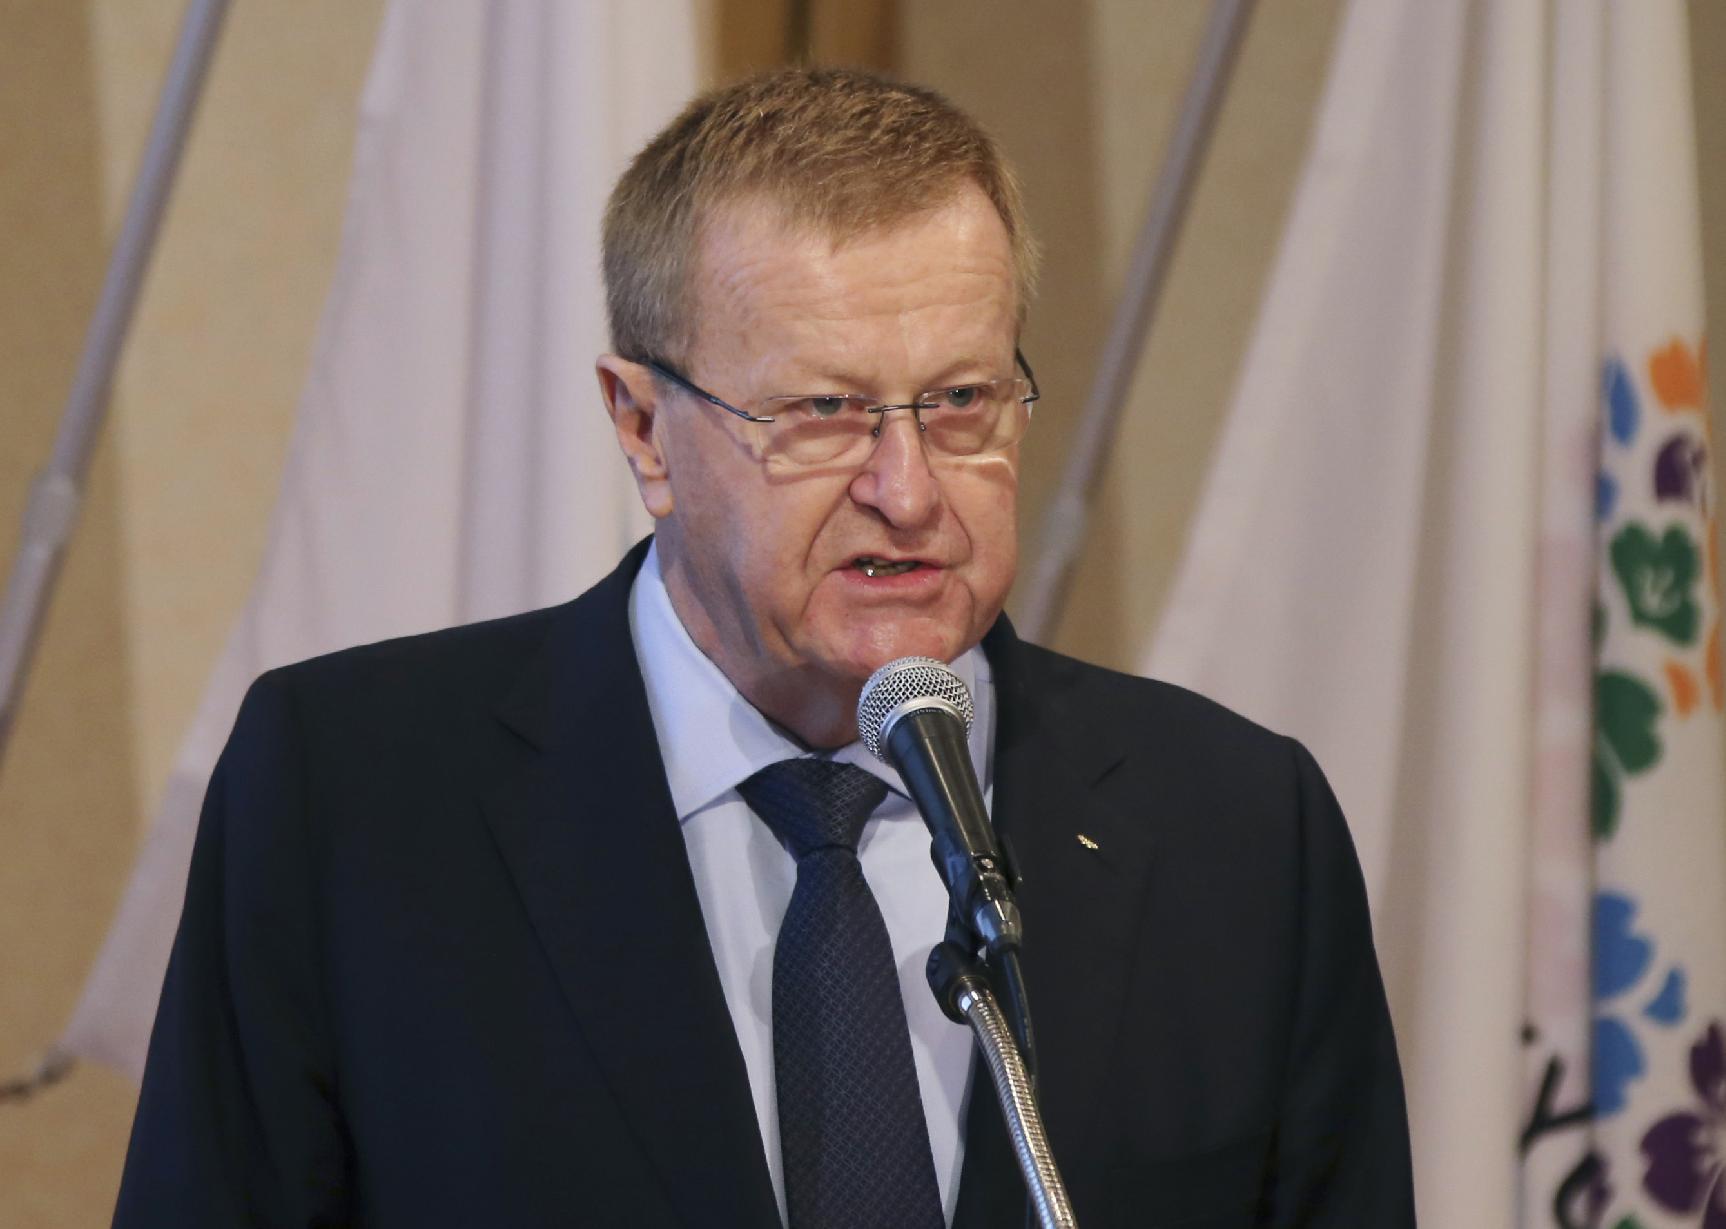 IOC vice president backtracks on Rio criticism